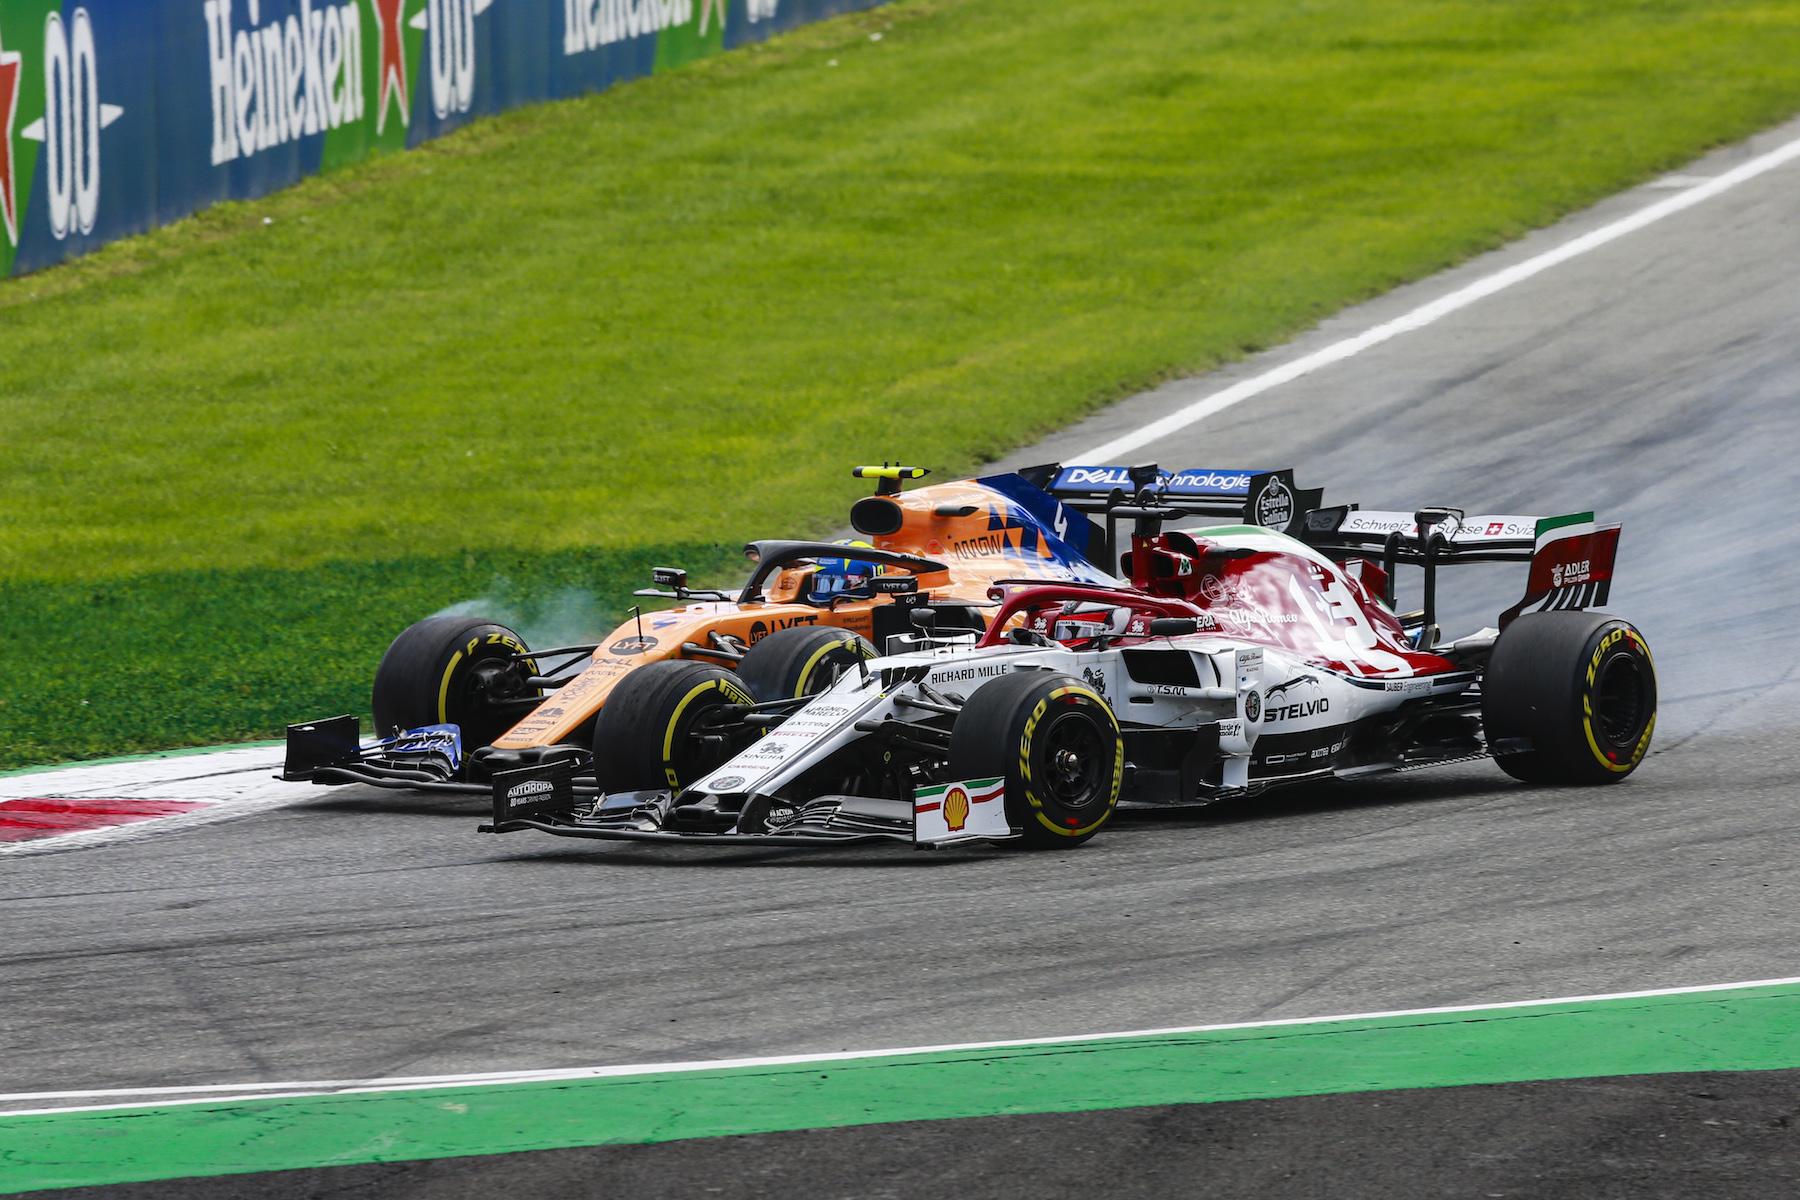 3 2019 Italian GP Sunday 17.JPG